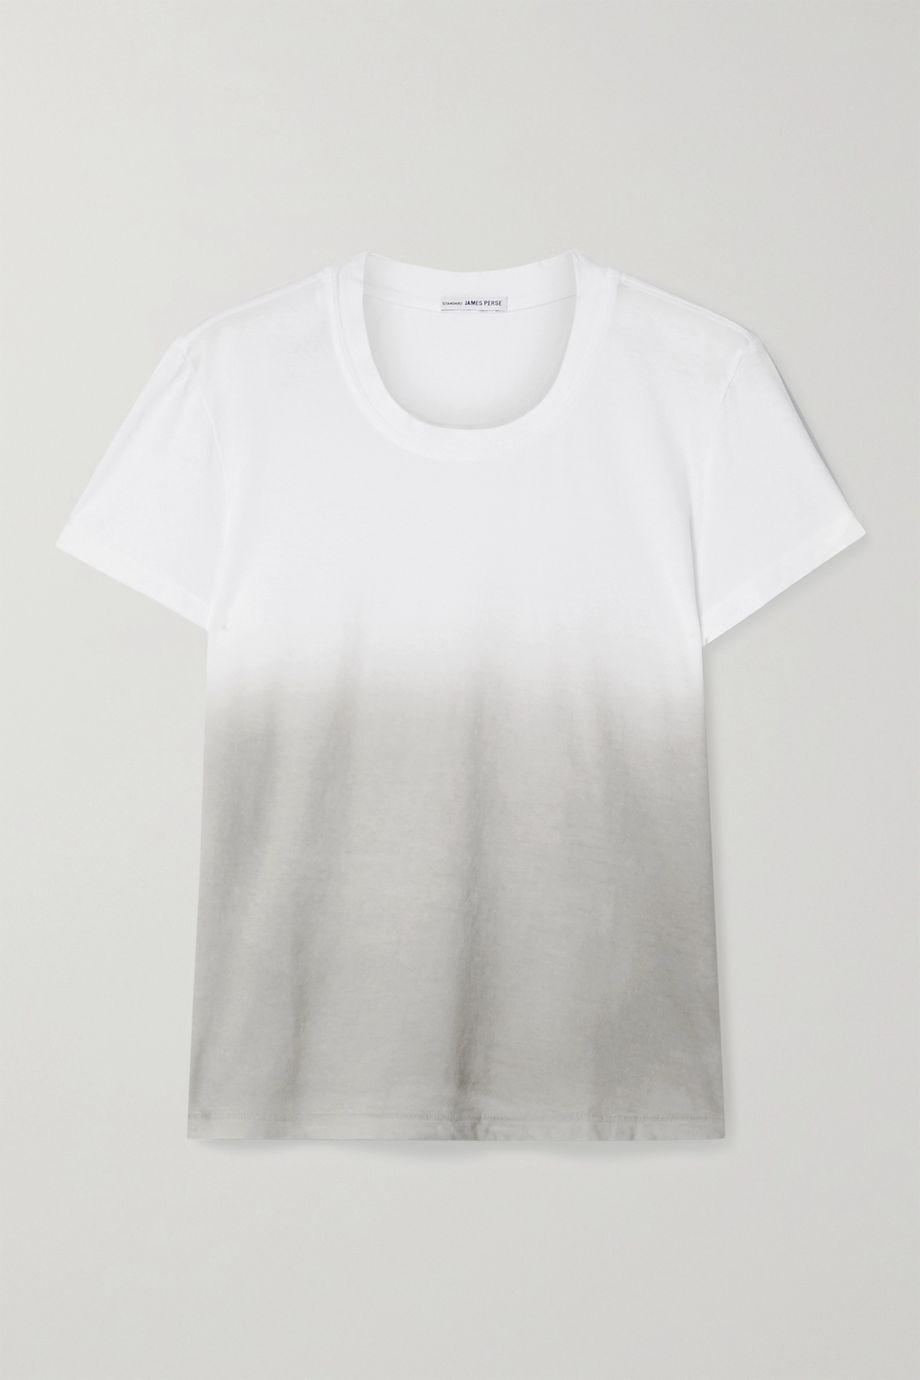 James Perse Boy ombré cotton-jersey T-shirt